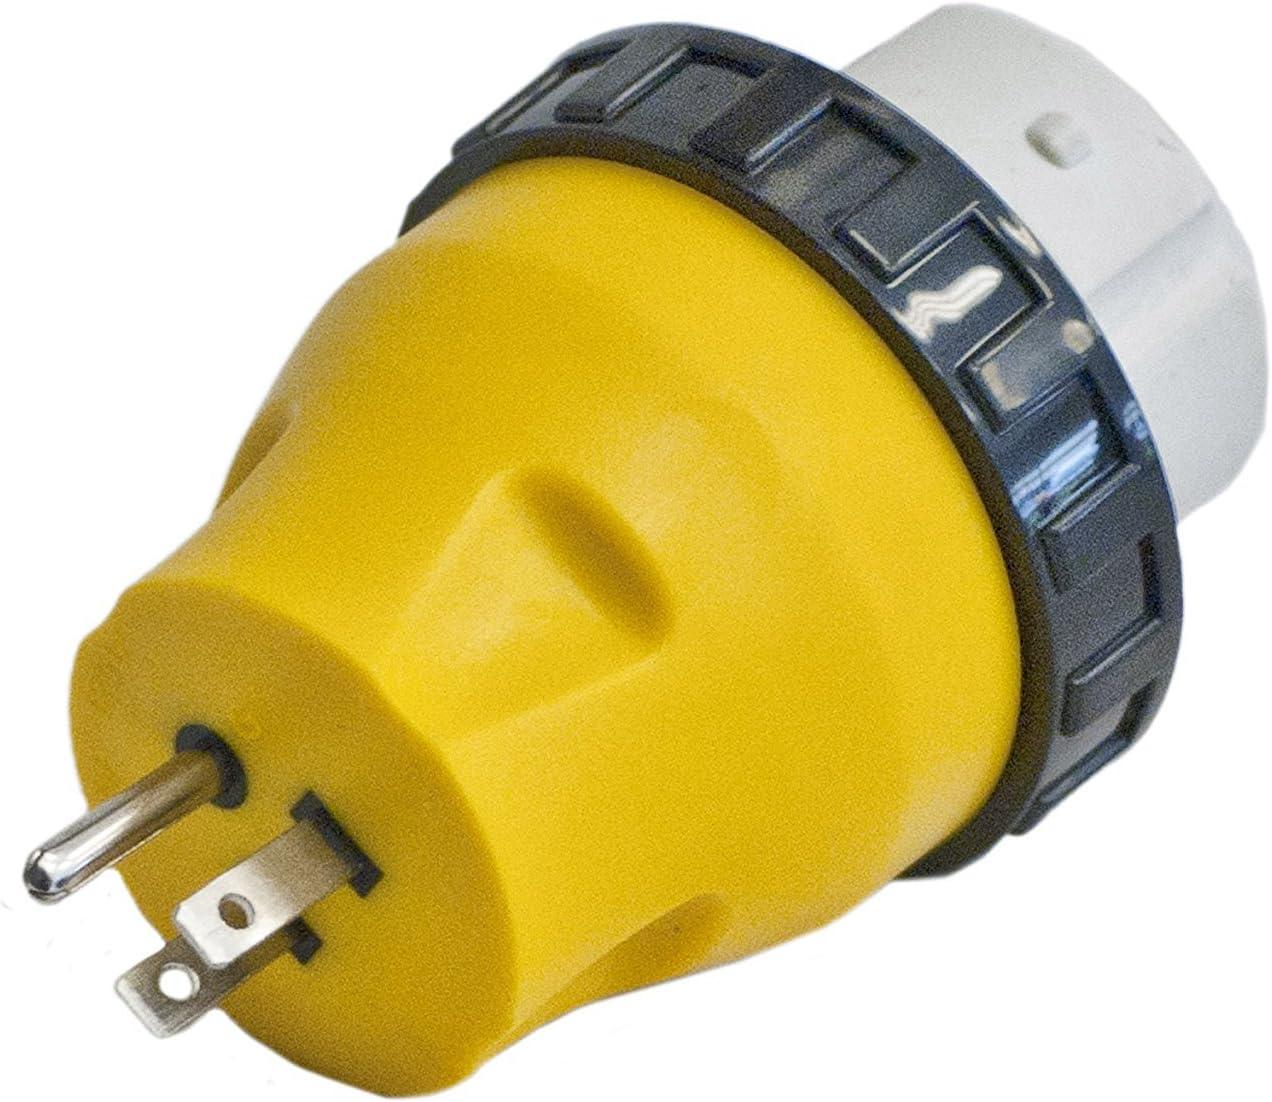 ALEKO L15-50 RV Electrical Locking Adapter 15A Male To 50A Female Locking Plug Connector